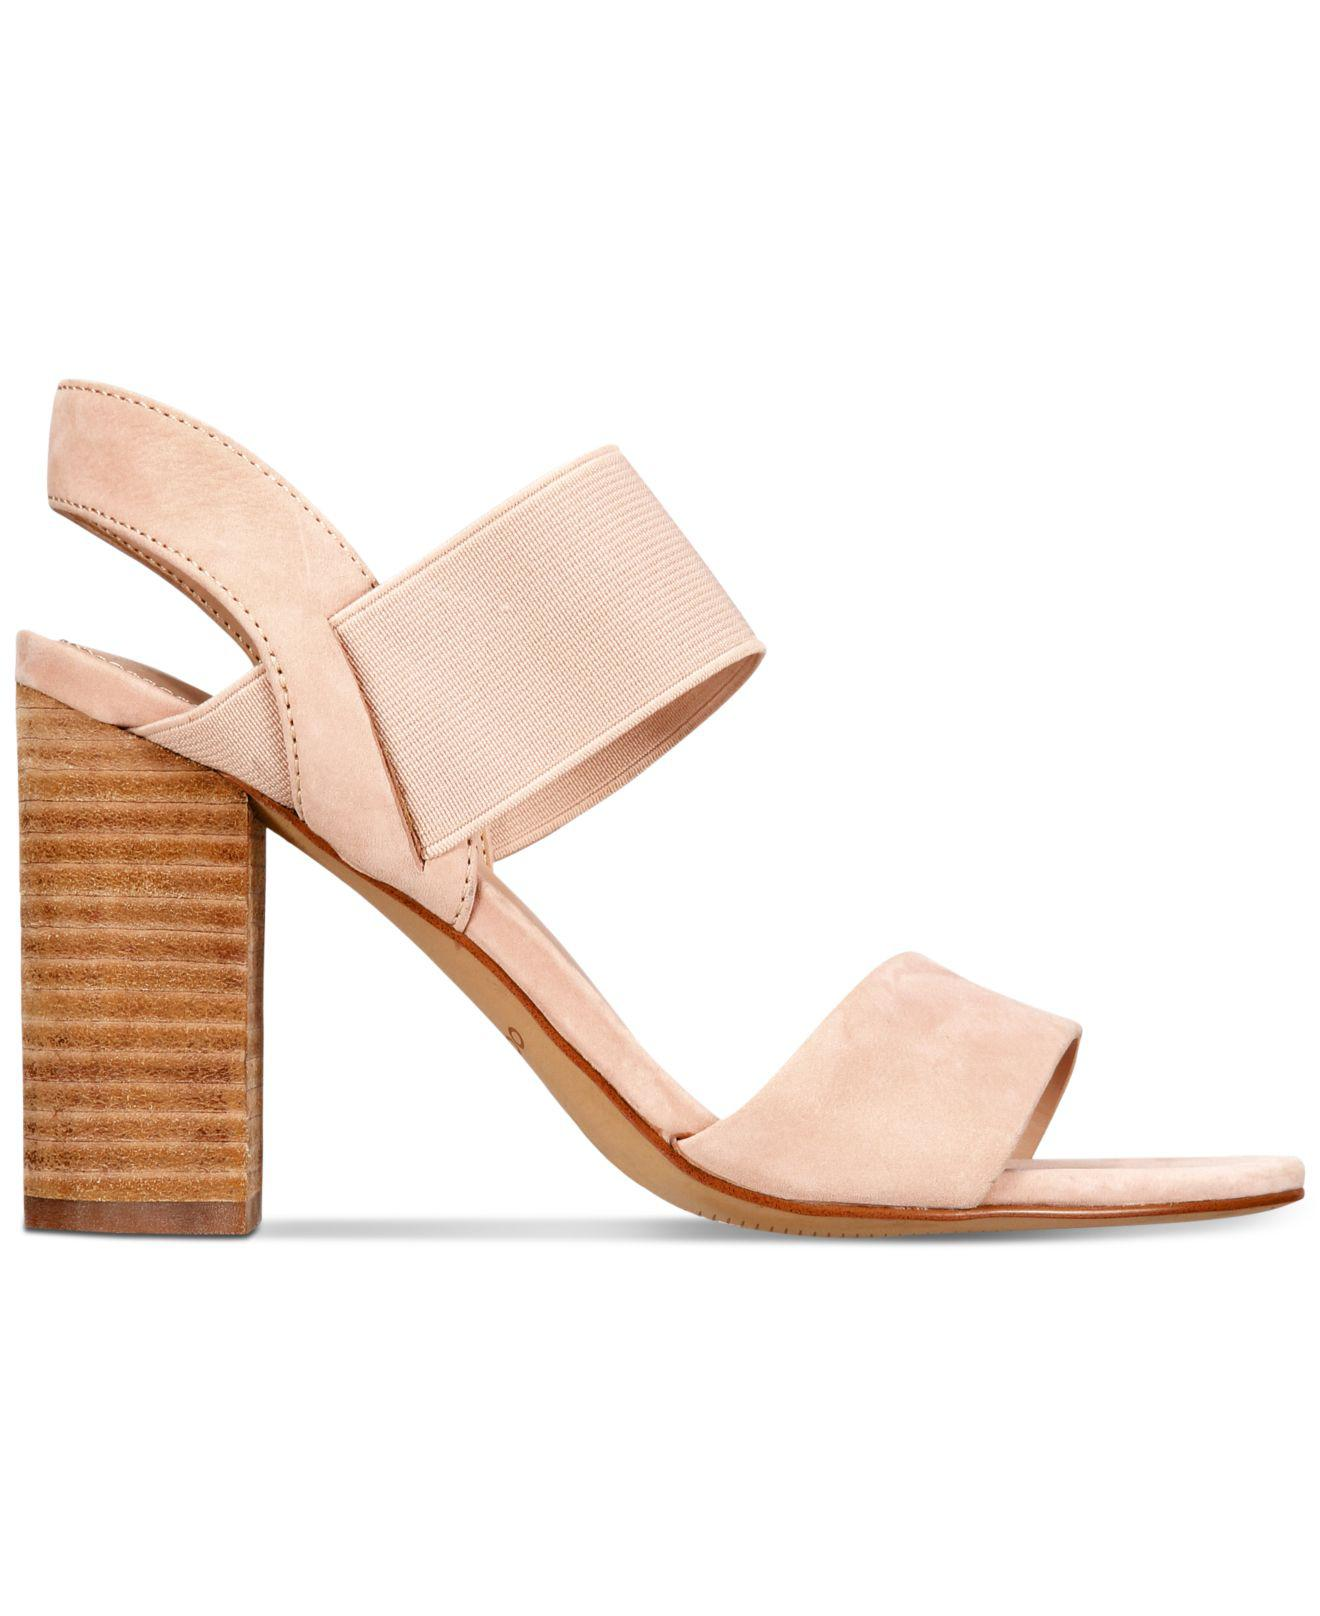 4a5b37aa9cfa Lyst - ALDO Mullyra Dress Sandals